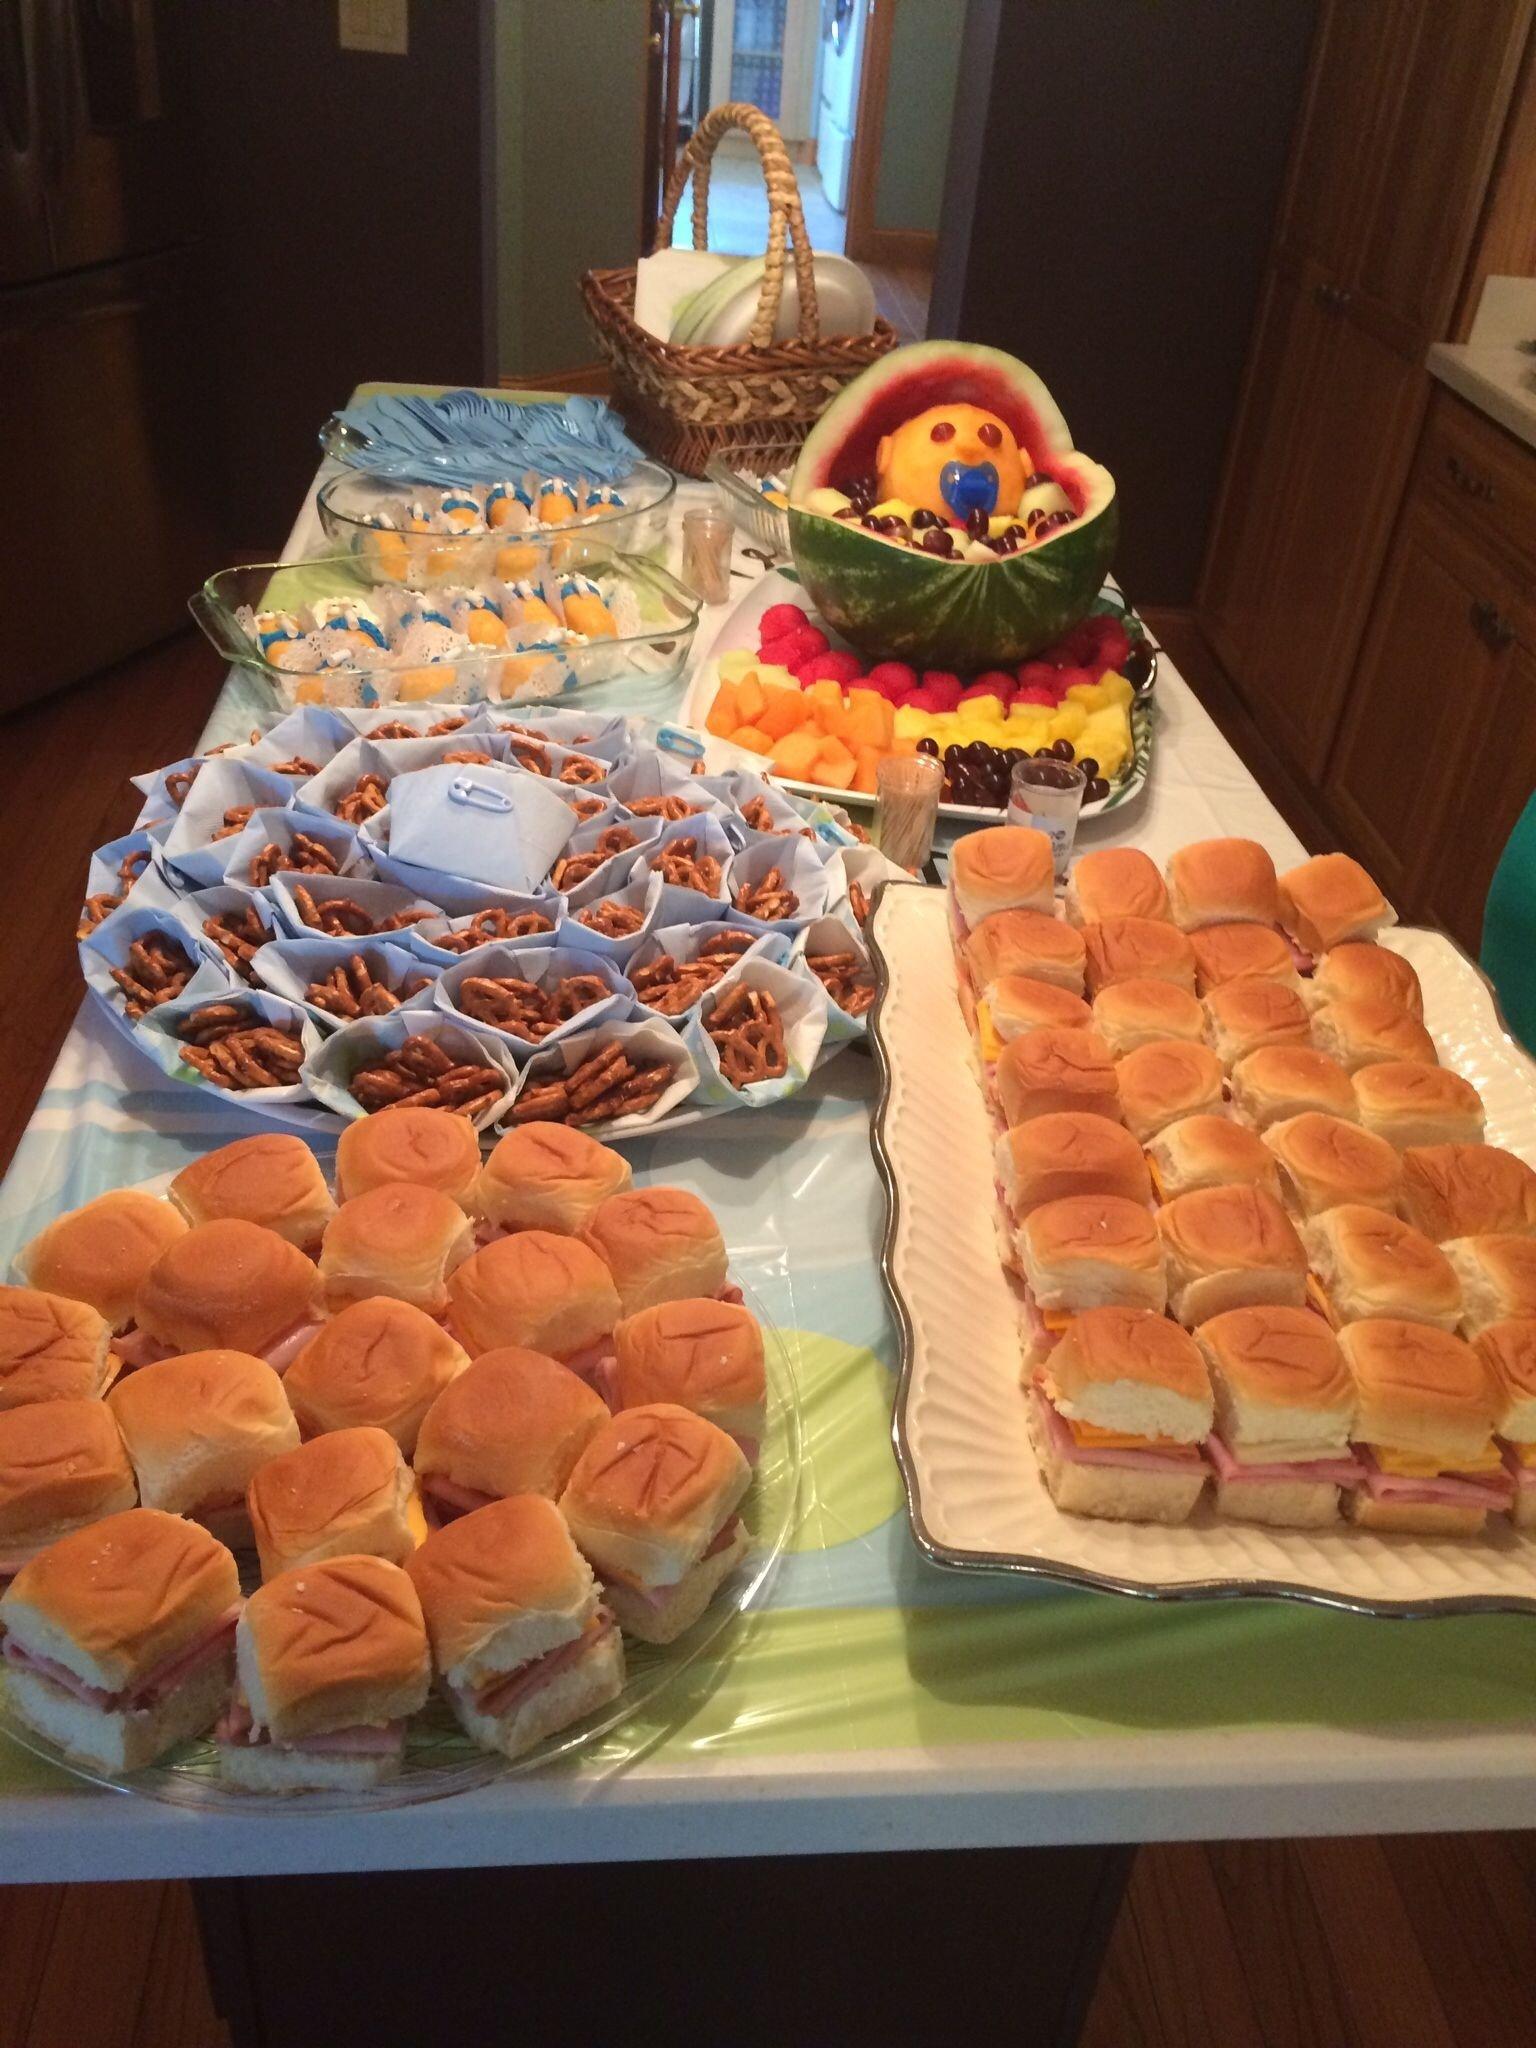 10 Stylish Food For Baby Shower Ideas baby shower food on a budget sandwiches on hawaiian rolls pretzel 4 2020